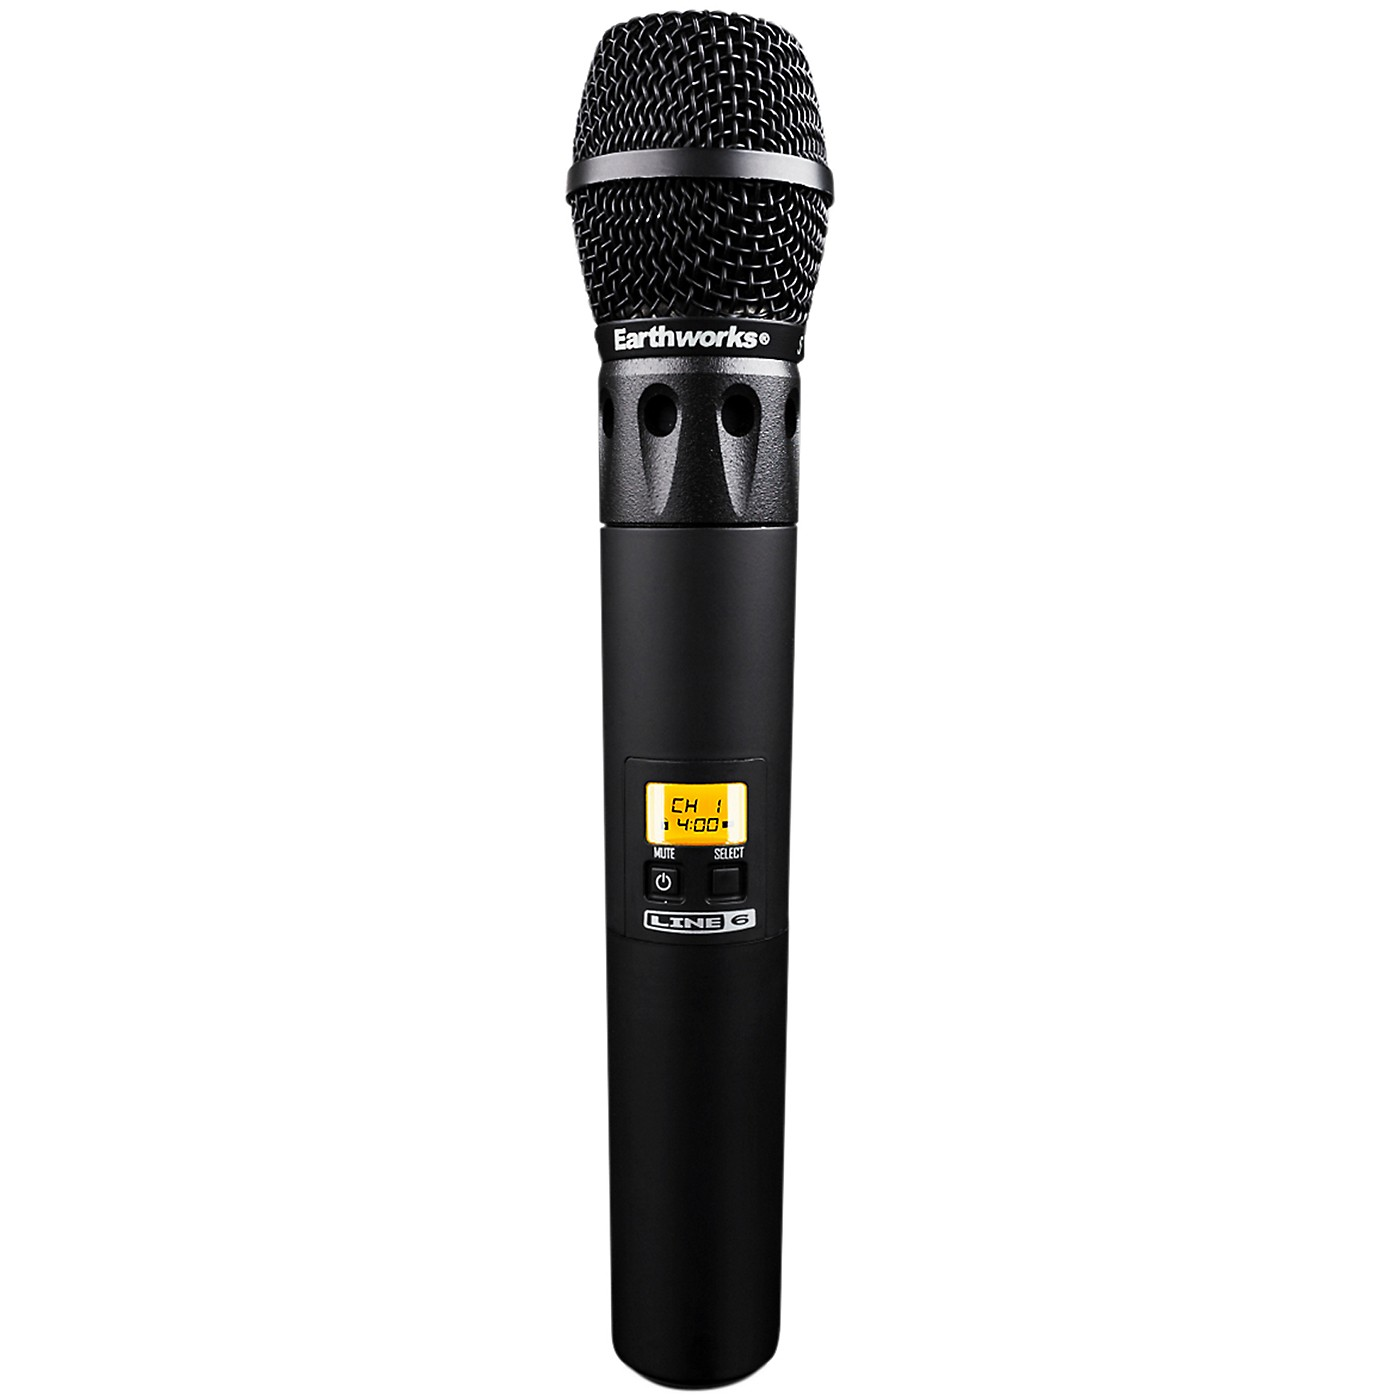 Line 6 V75-40V Digital Wireless Microphone w/ Earthworks WL40V Capsule thumbnail